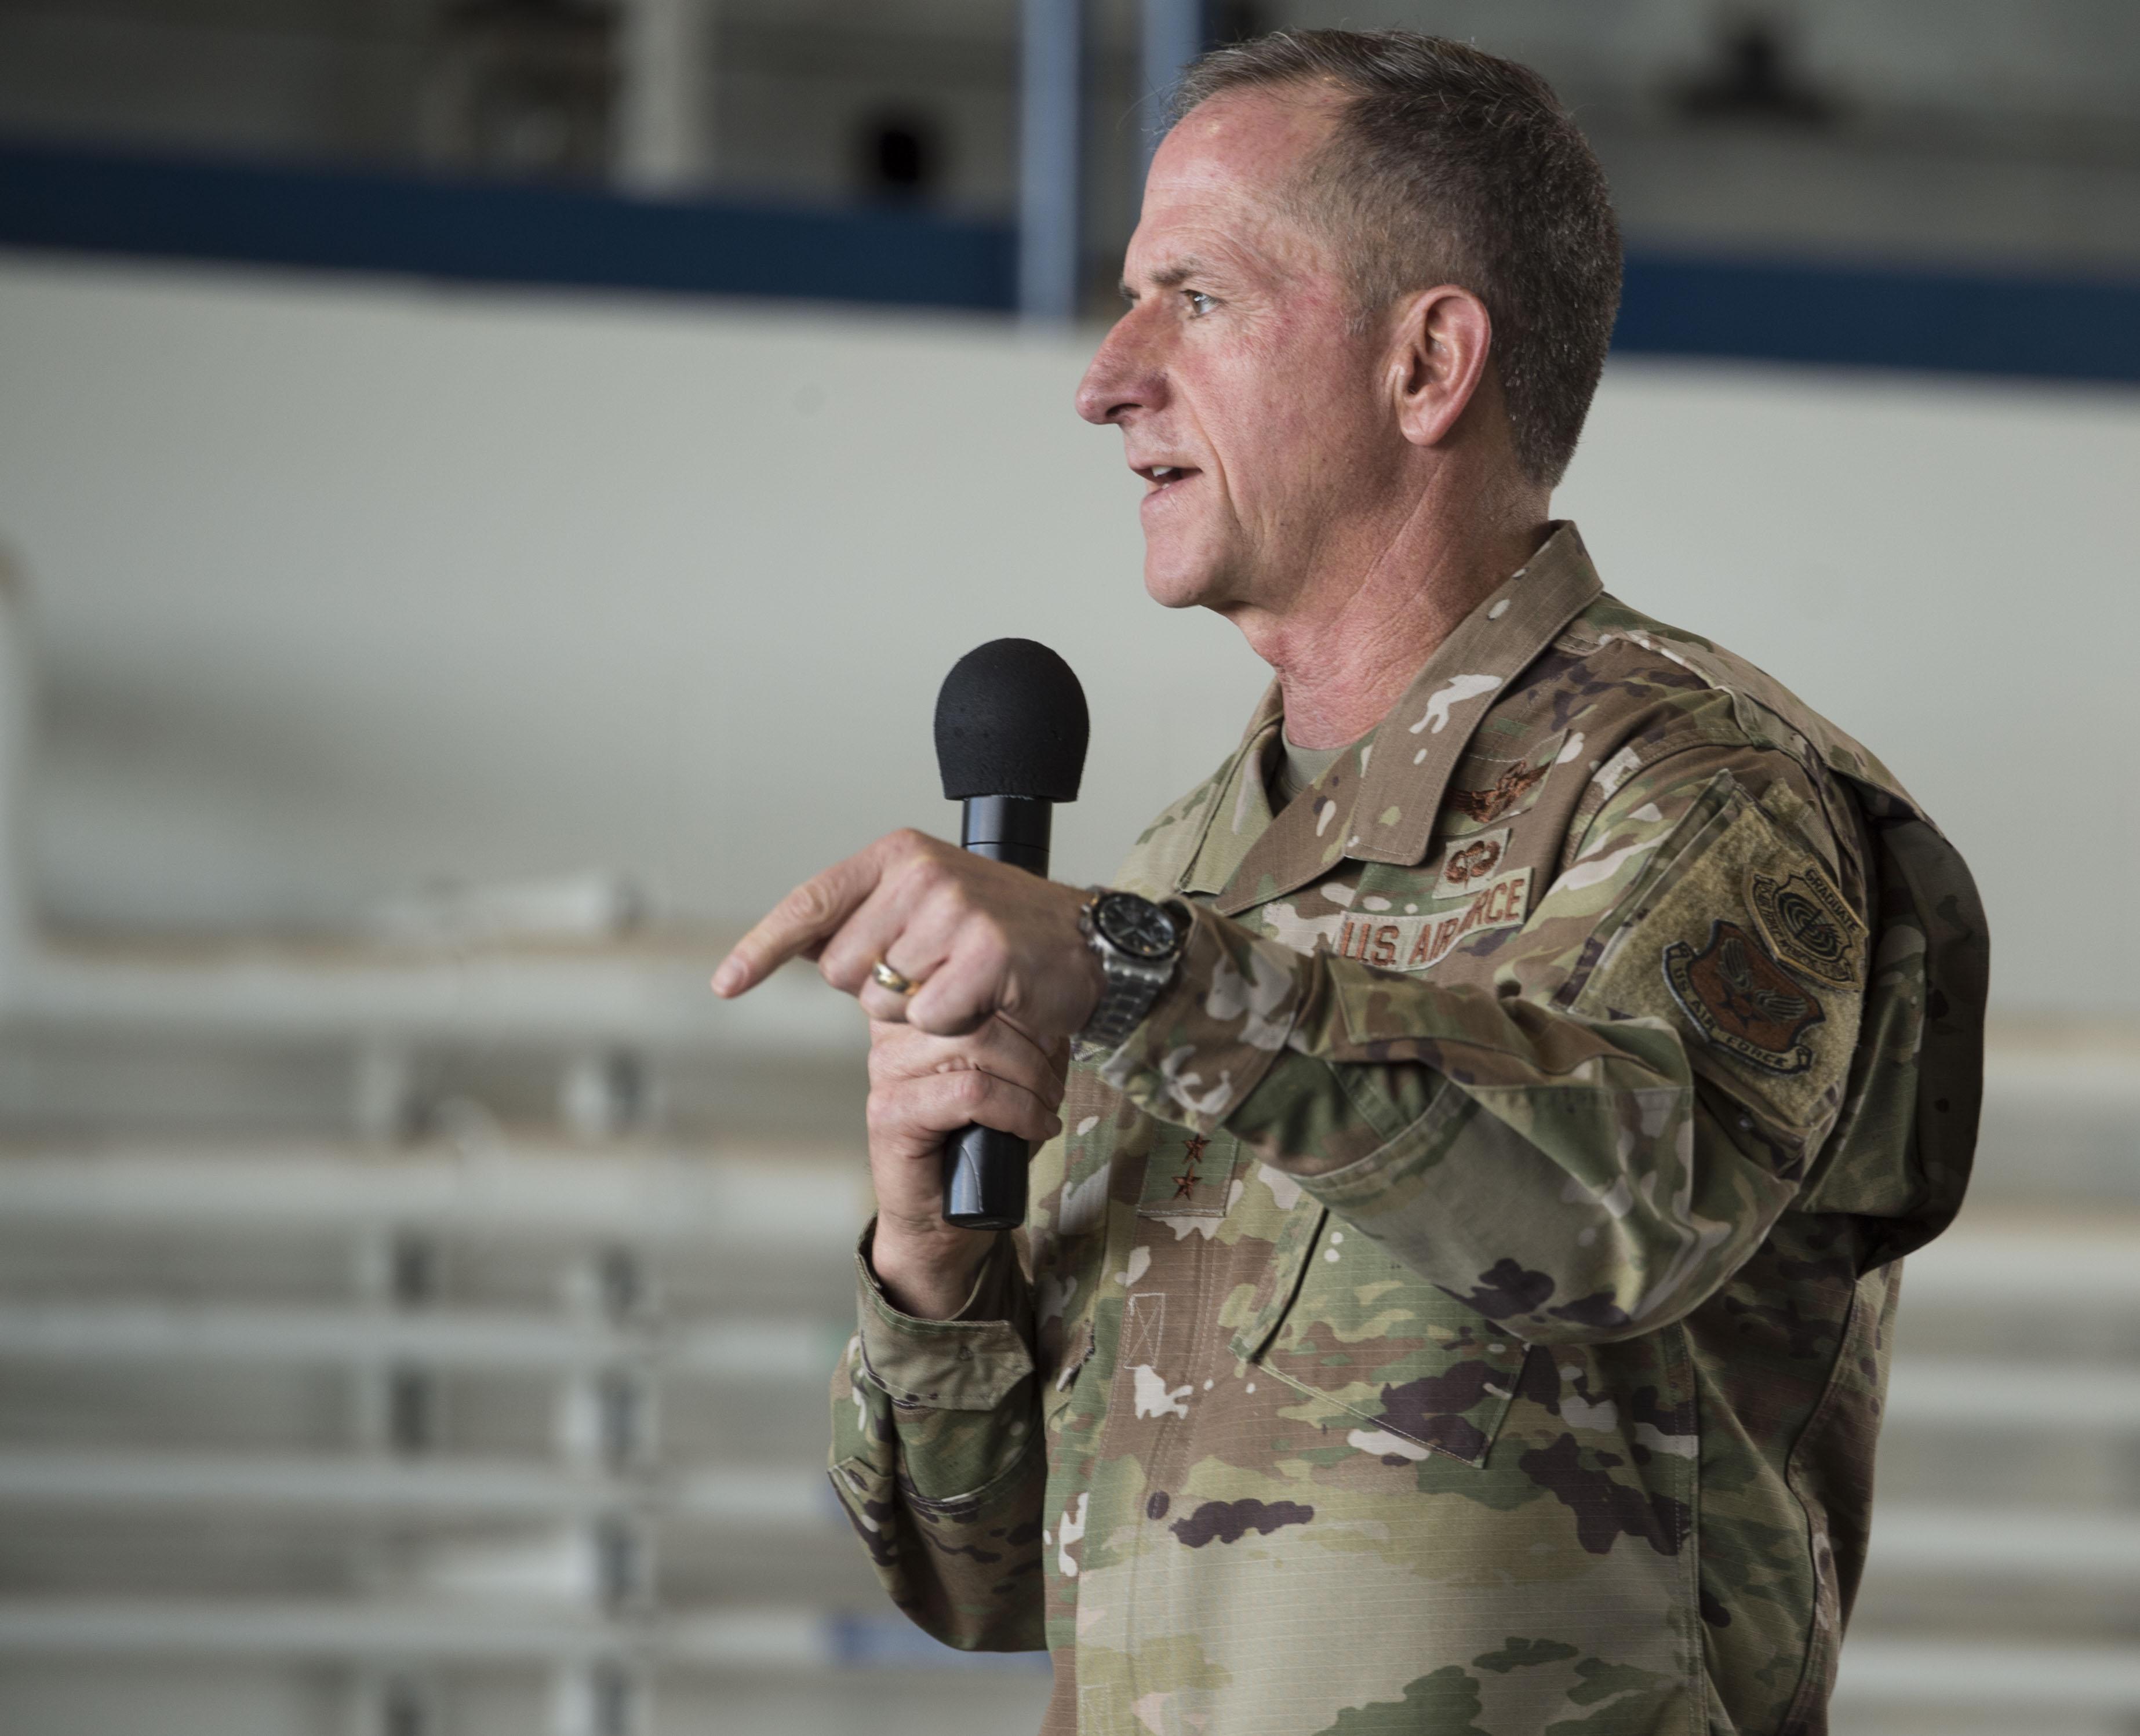 CSAF visits JBPHH, shares priorities with Sky Warrior team